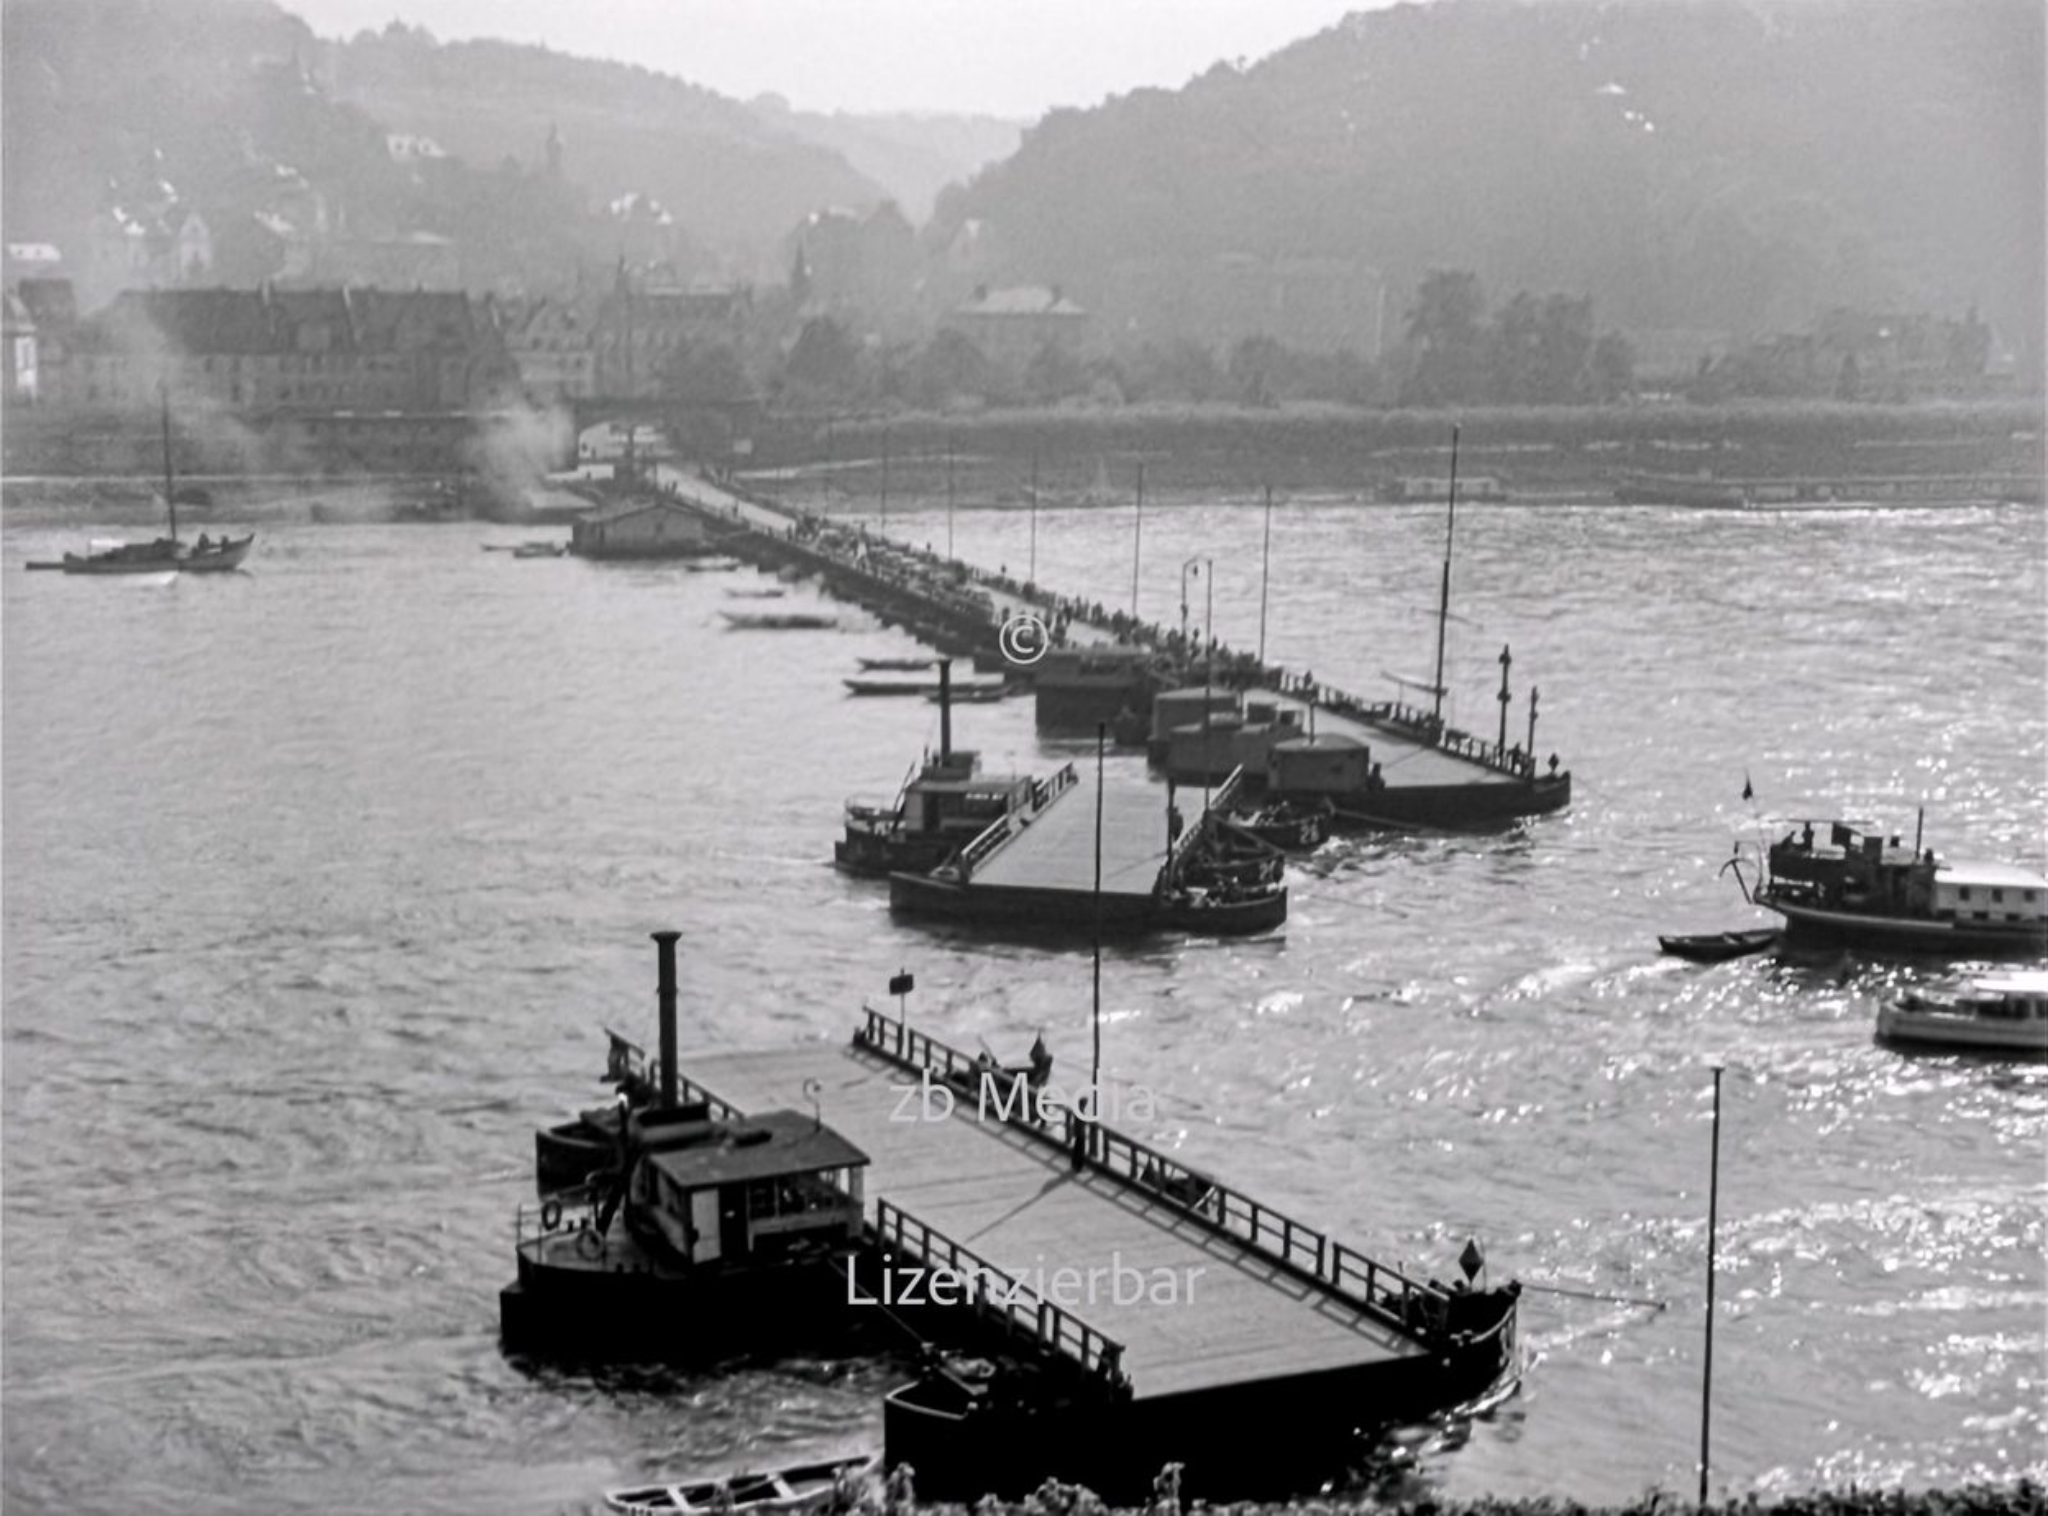 Fährbrücke am Rhein bei Königswinter 1937